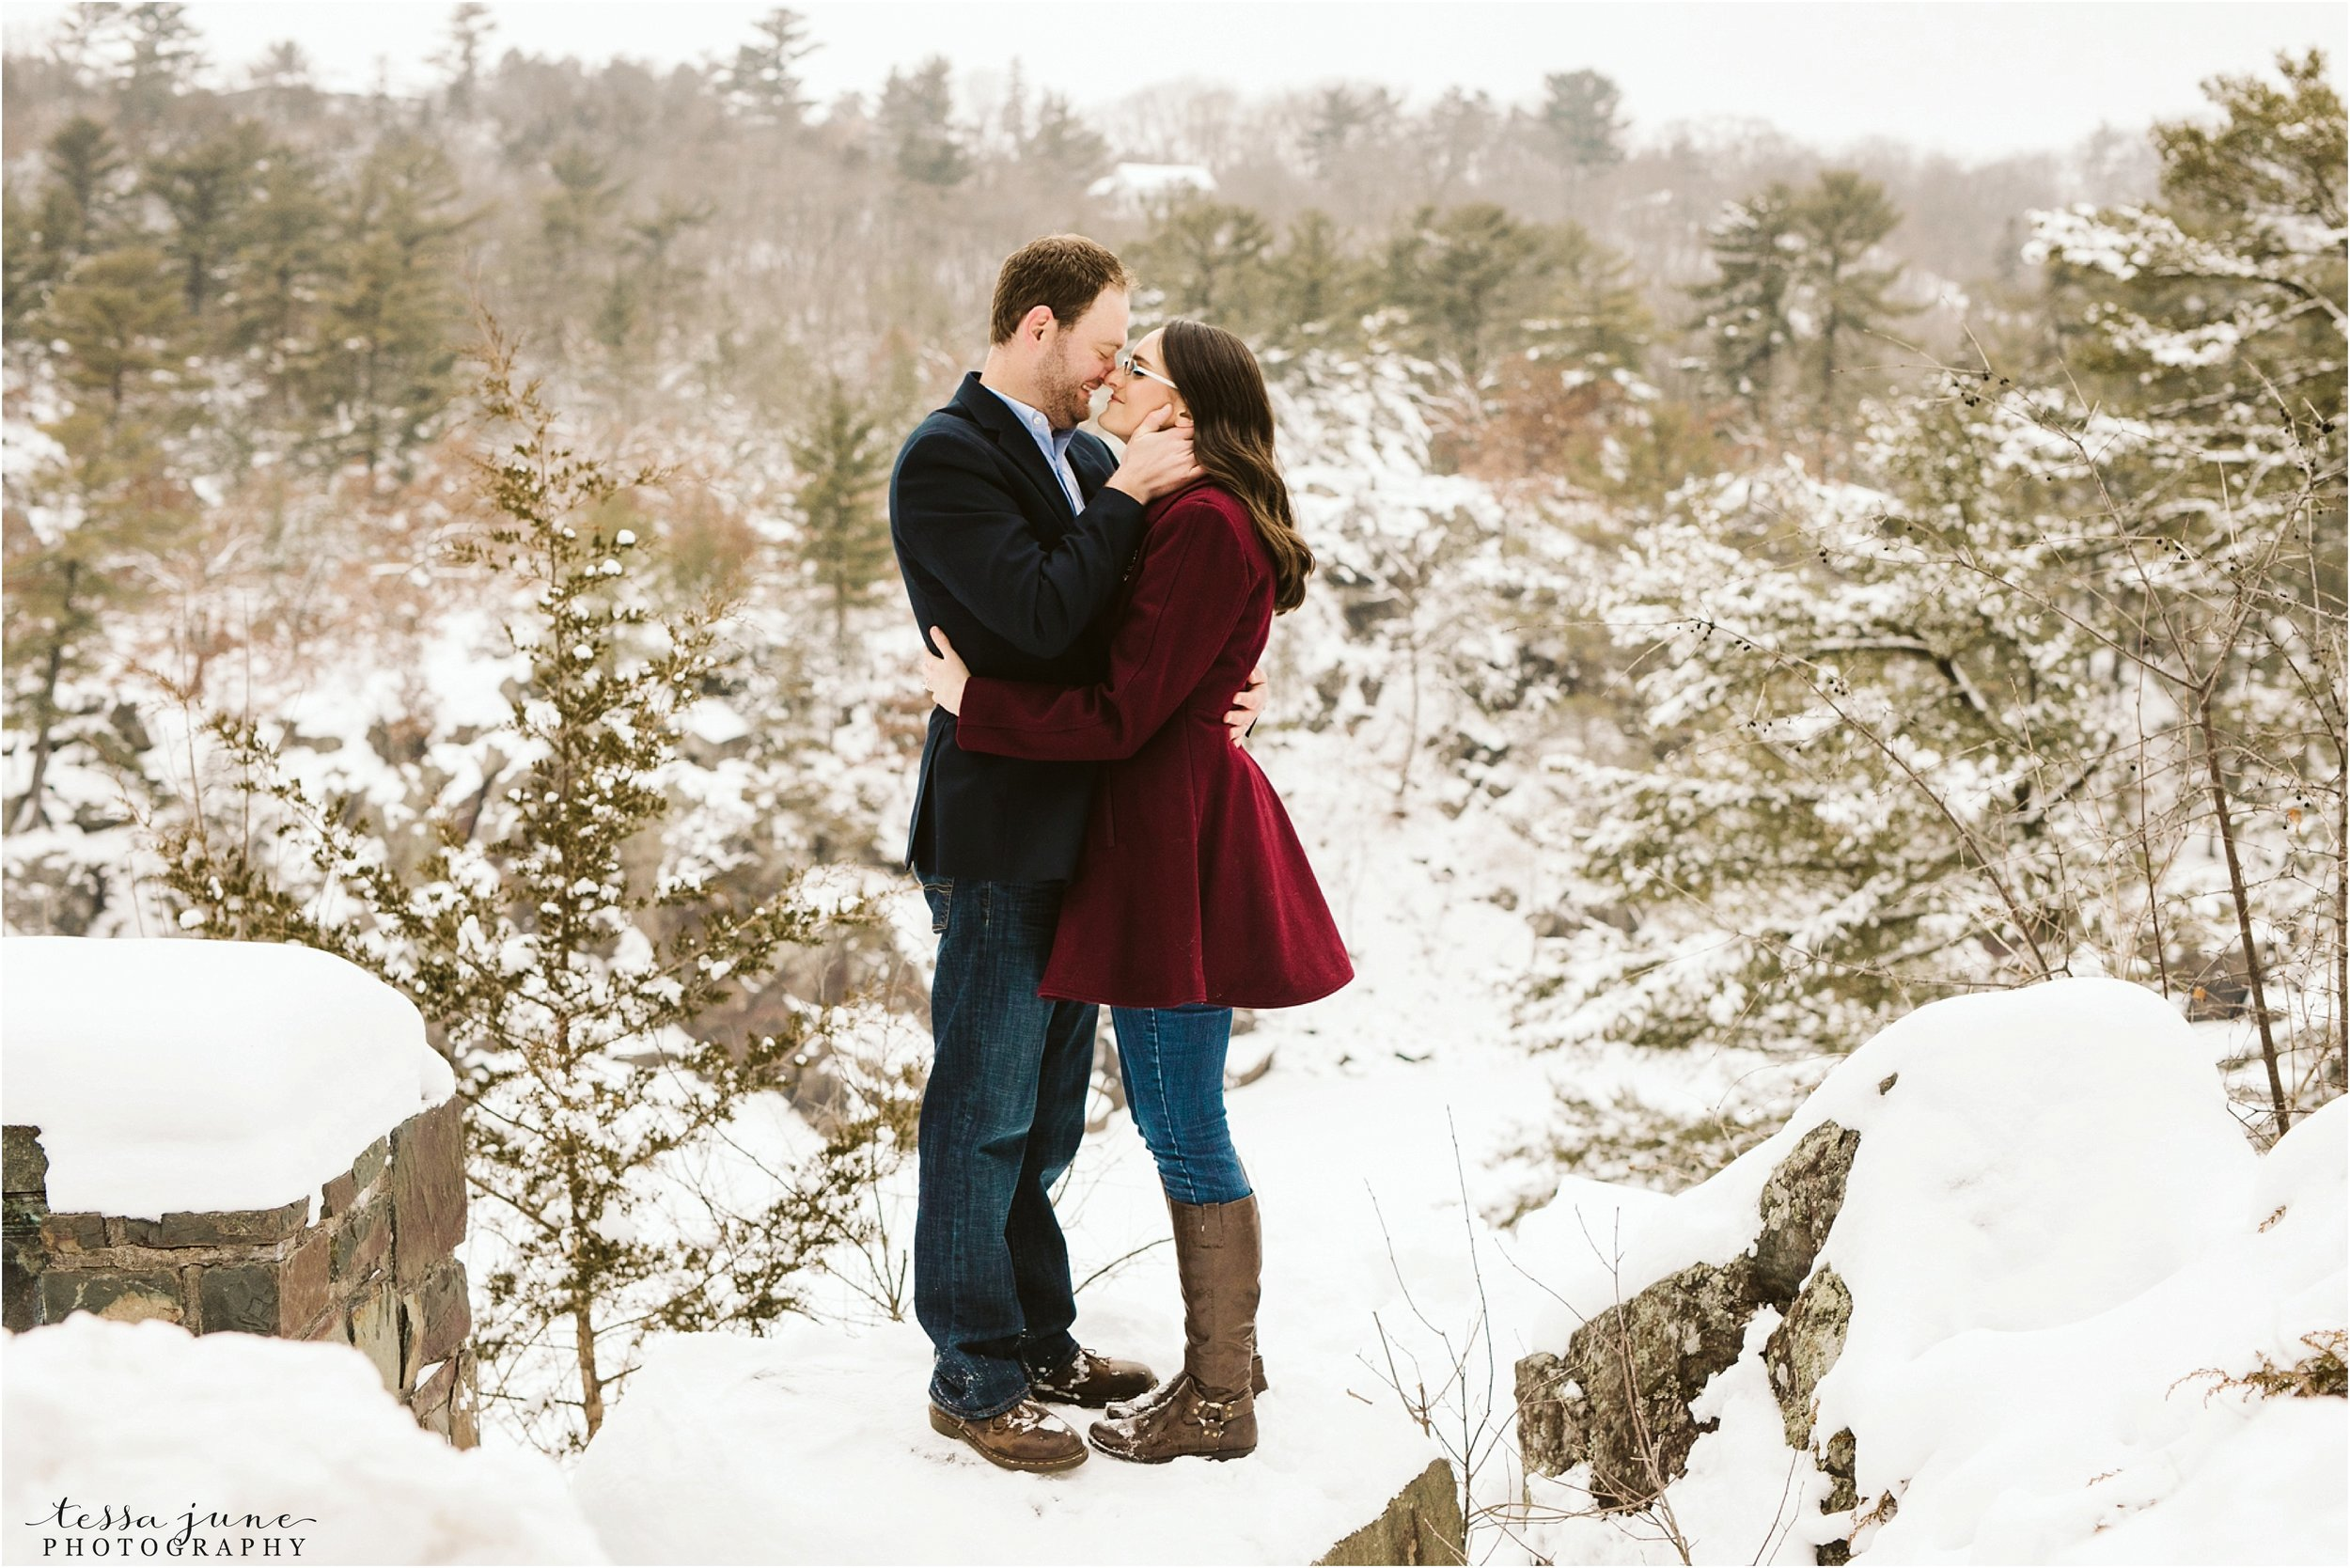 taylors-falls-winter-engagement-session-st-cloud-photographer-20.jpg